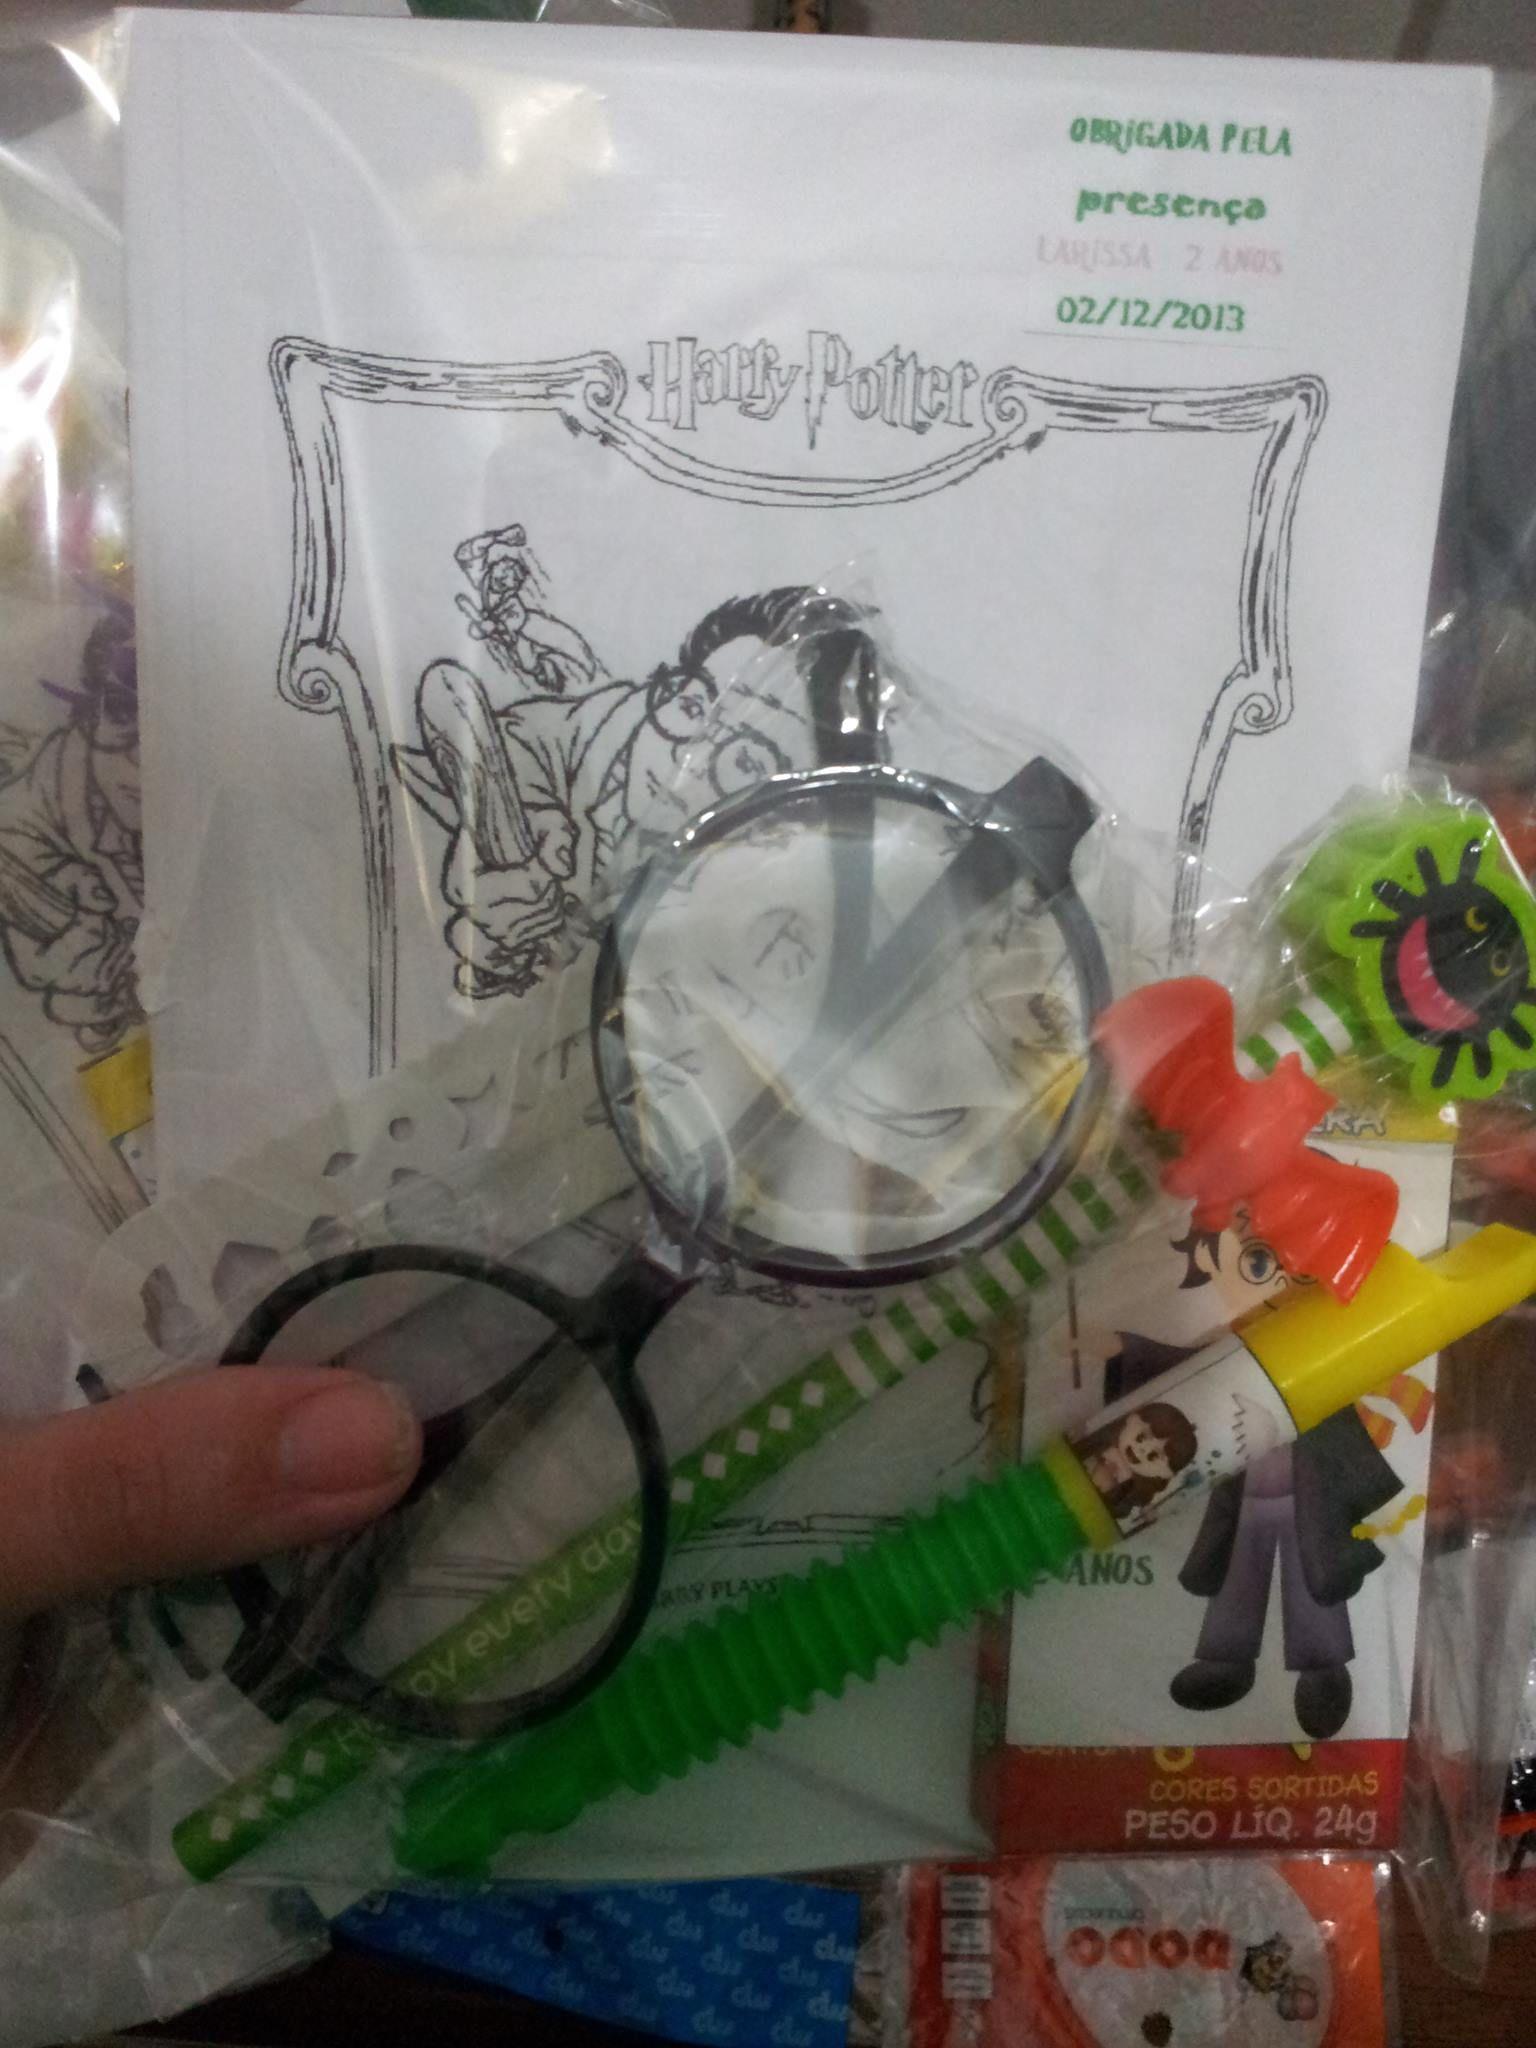 Harry Potter Birthday party gift souvenir pencil